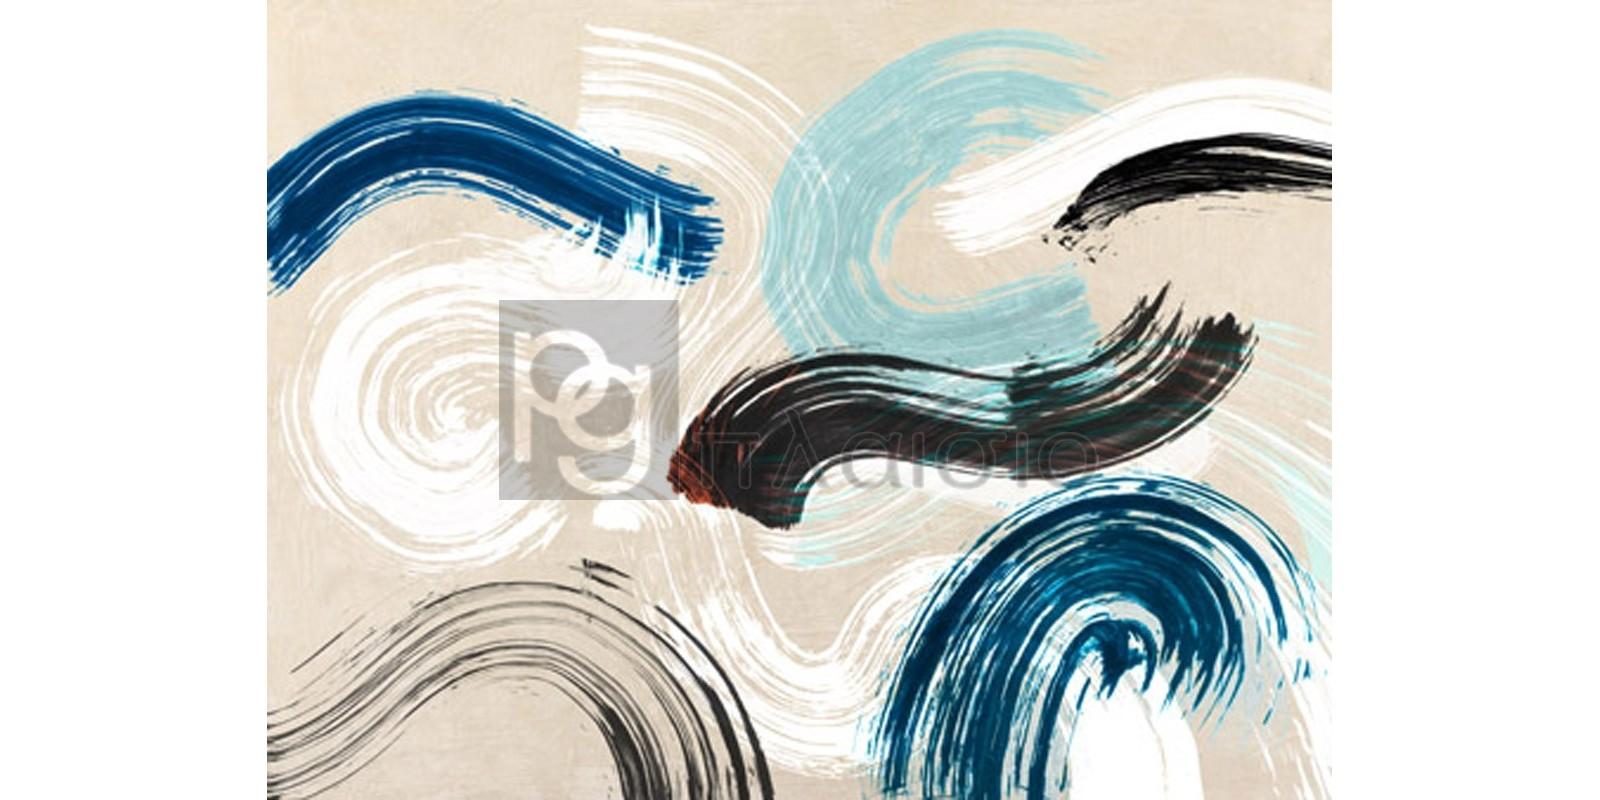 Haru Ikeda - Waves